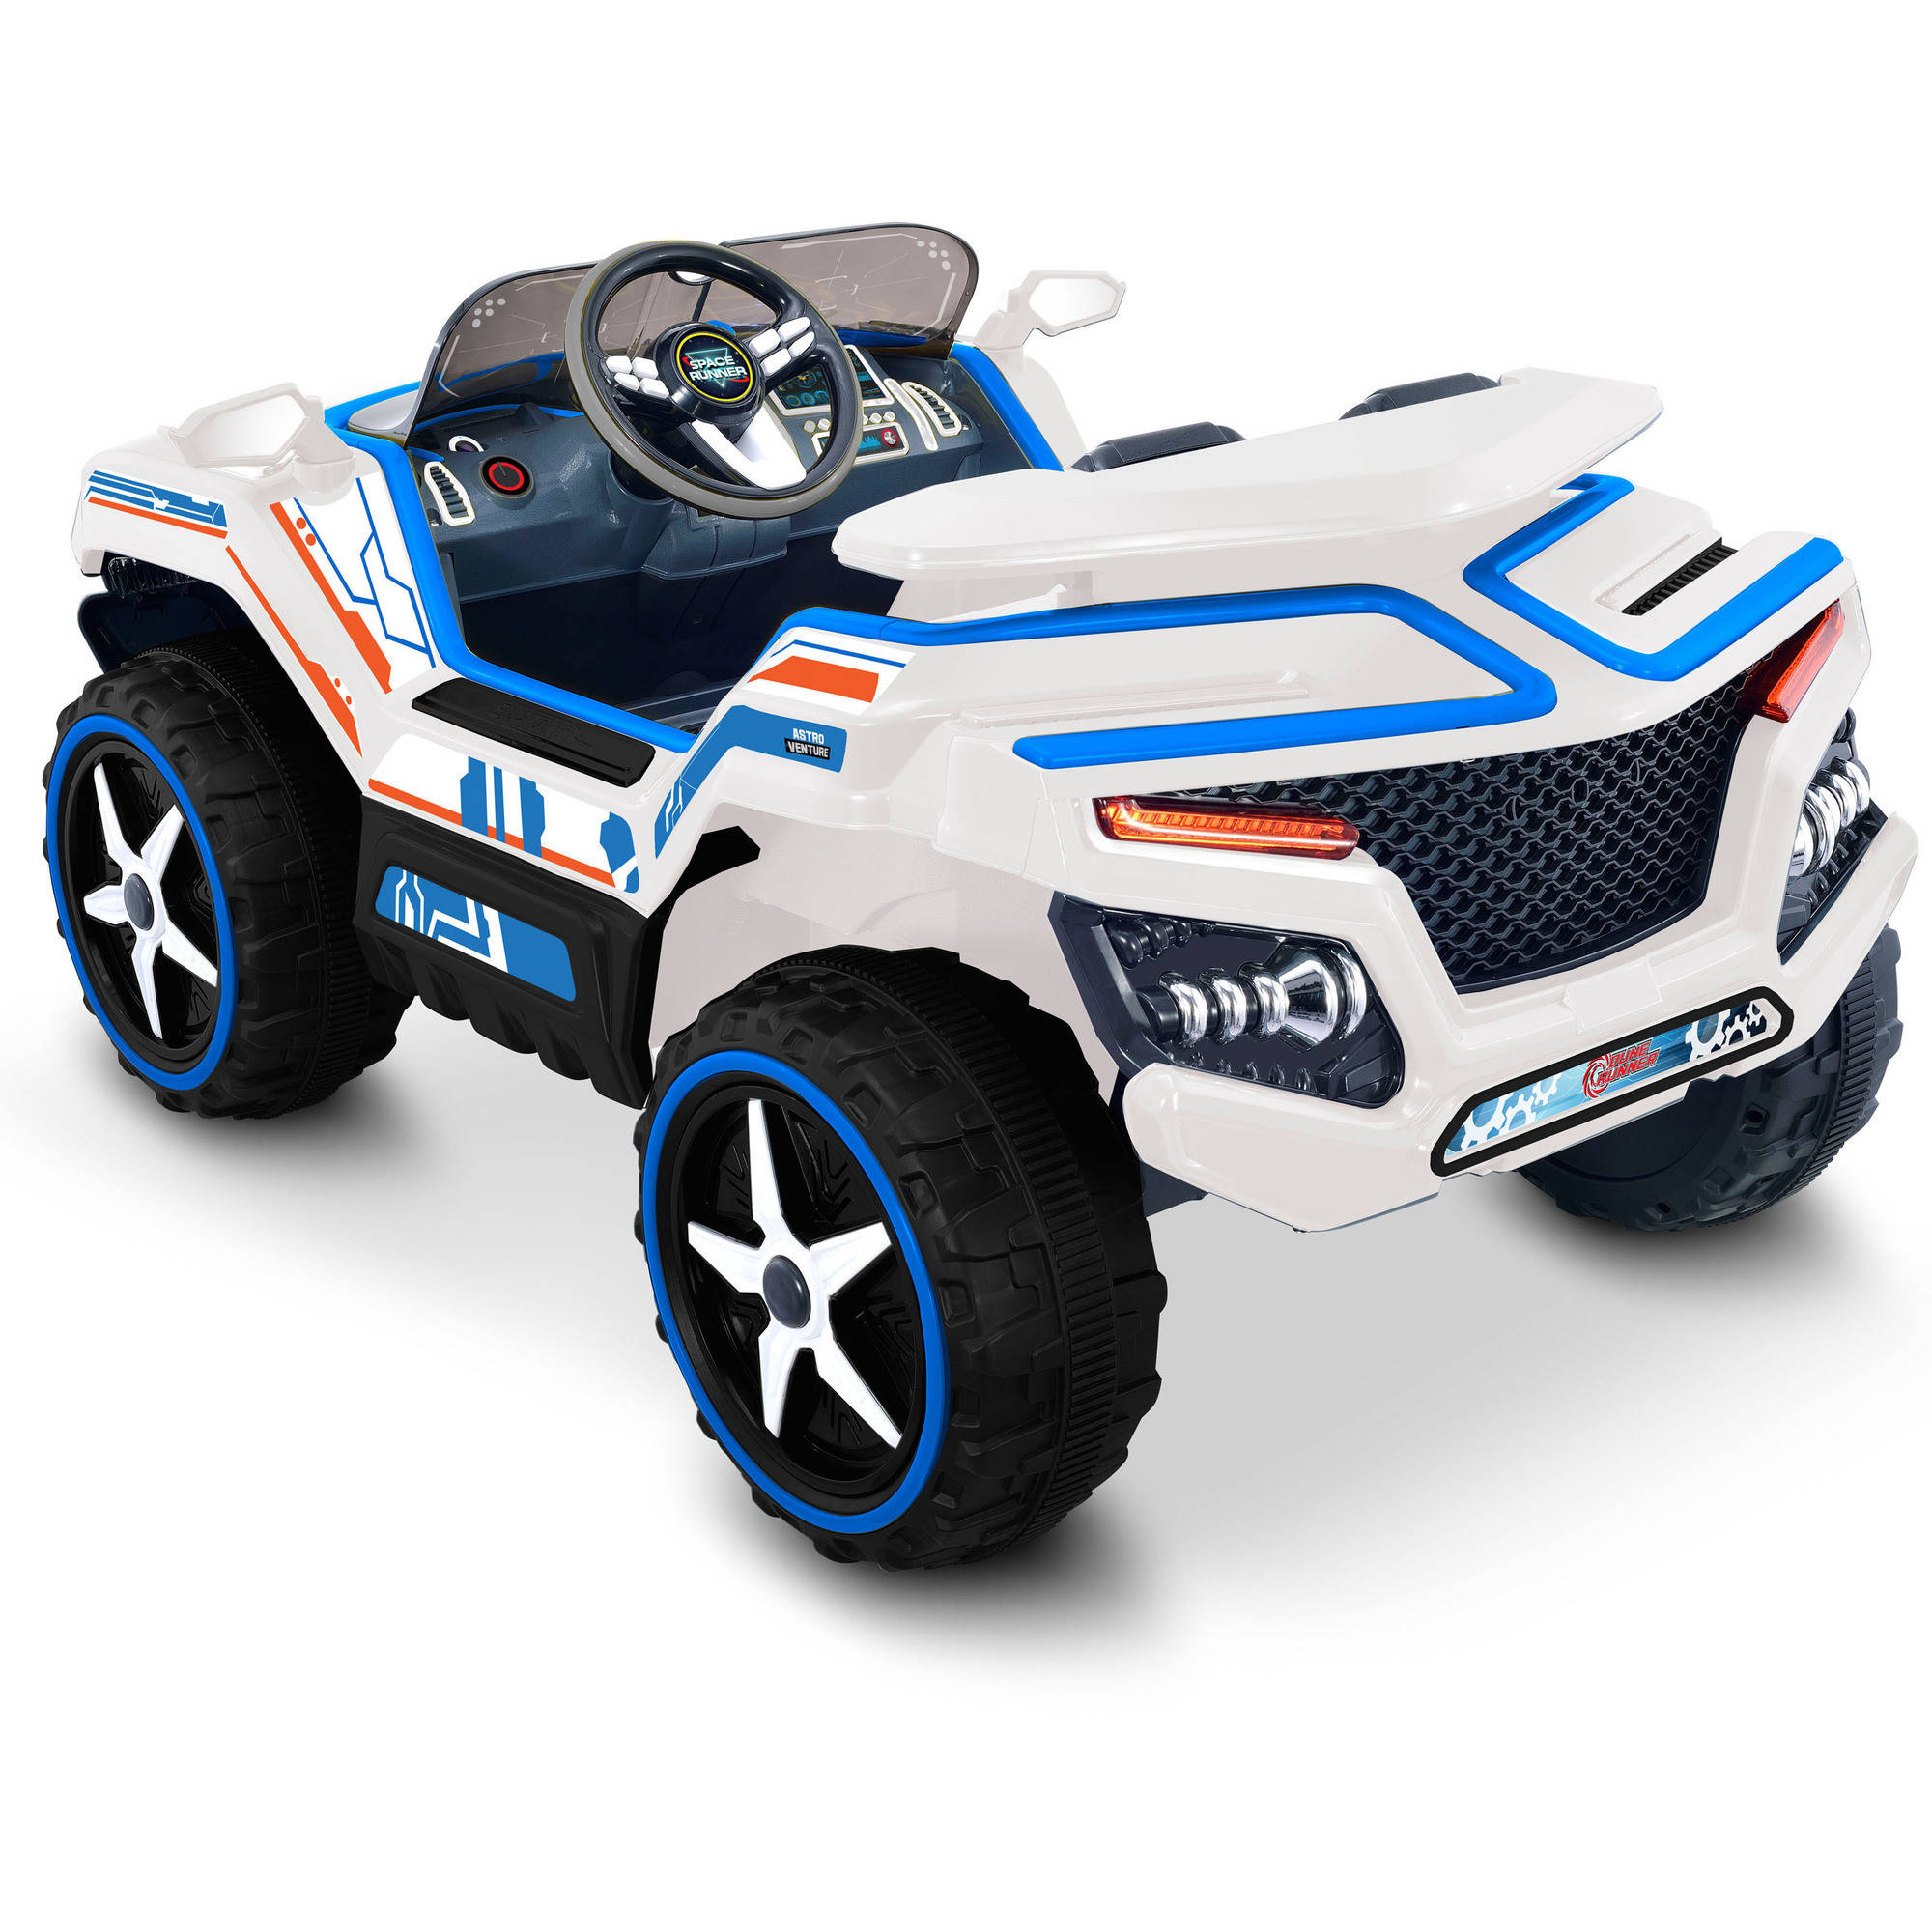 Kid Motorz 12V Dune Runner Two-Seater Ride-On, Space Version